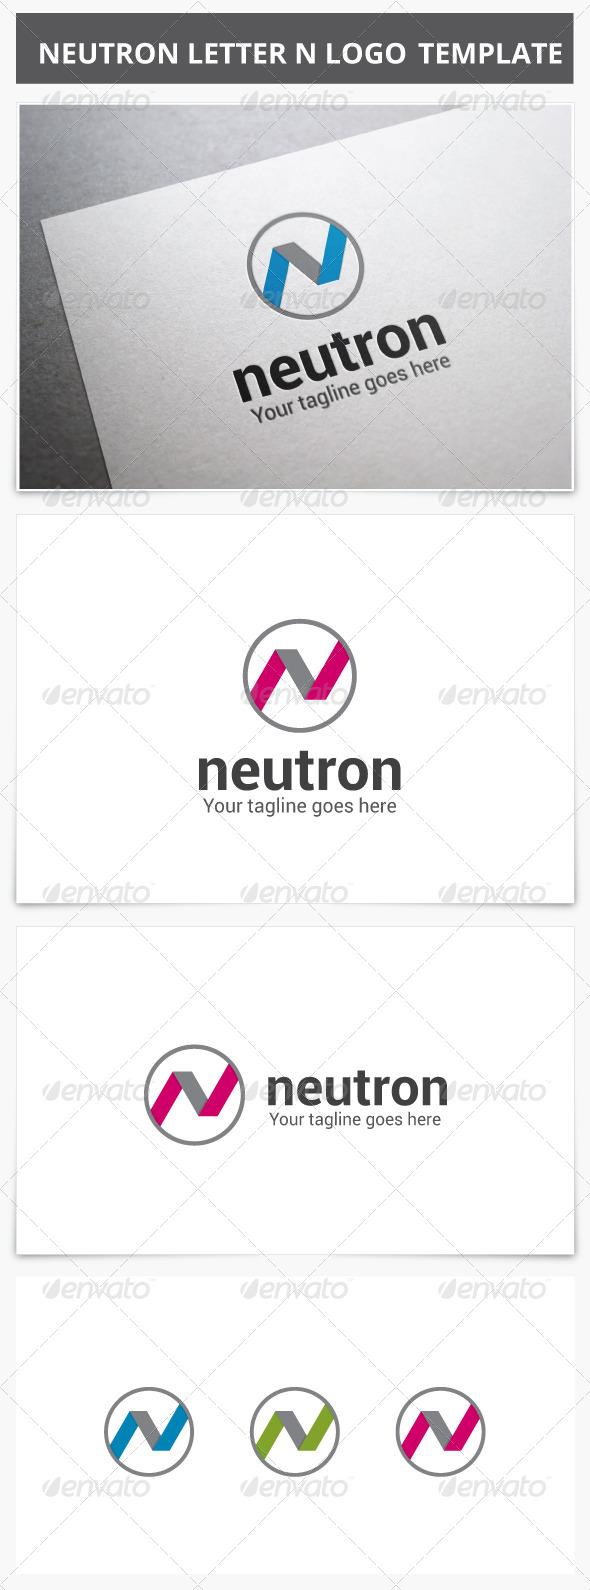 GraphicRiver Neutron Letter N Logo 7720609